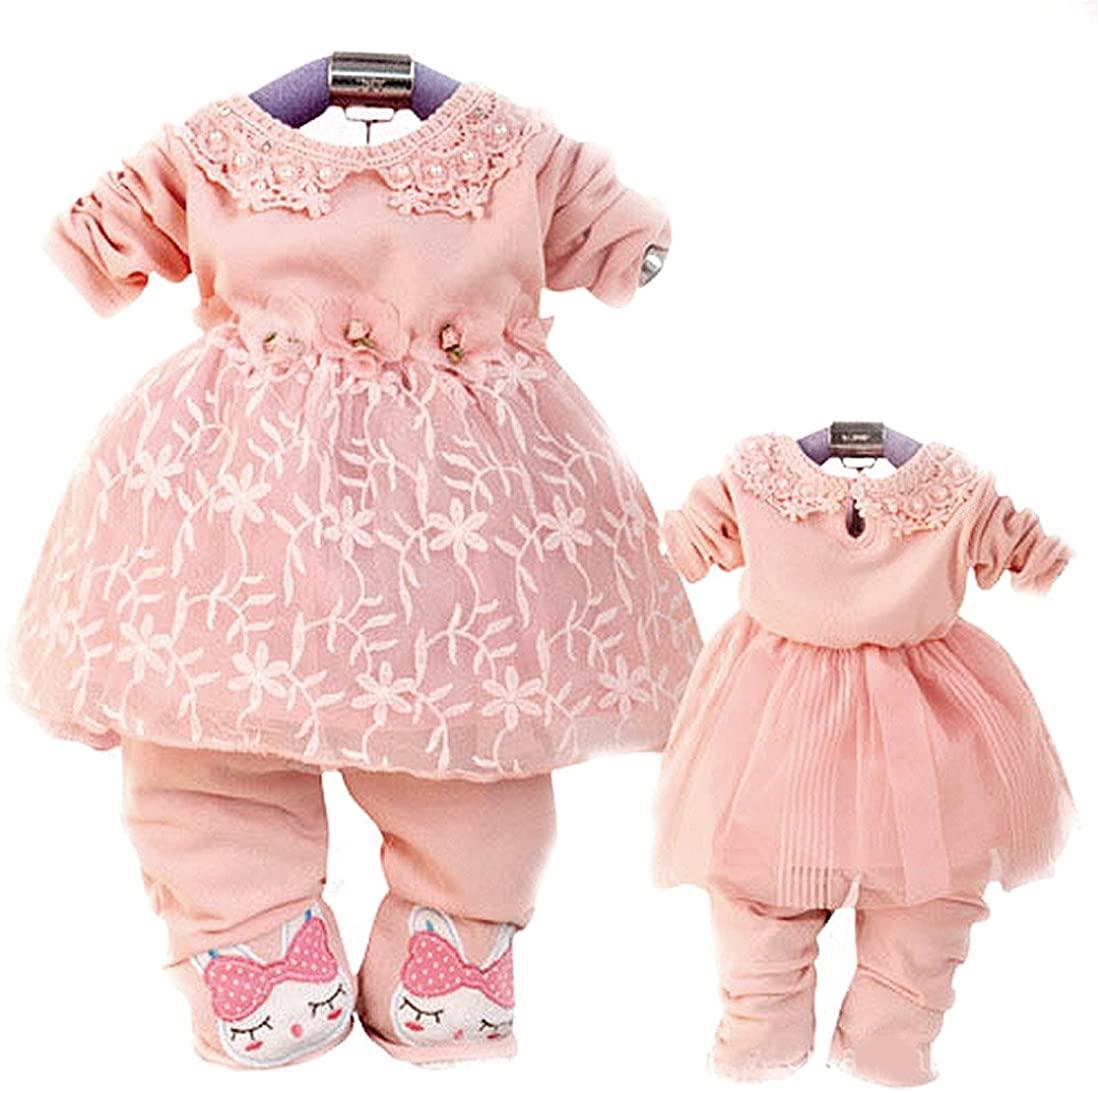 SOPO Baby Girls Outfits 2 Piece Set Flower TuTu Dress & Cute Rabbit Pants P9-24m